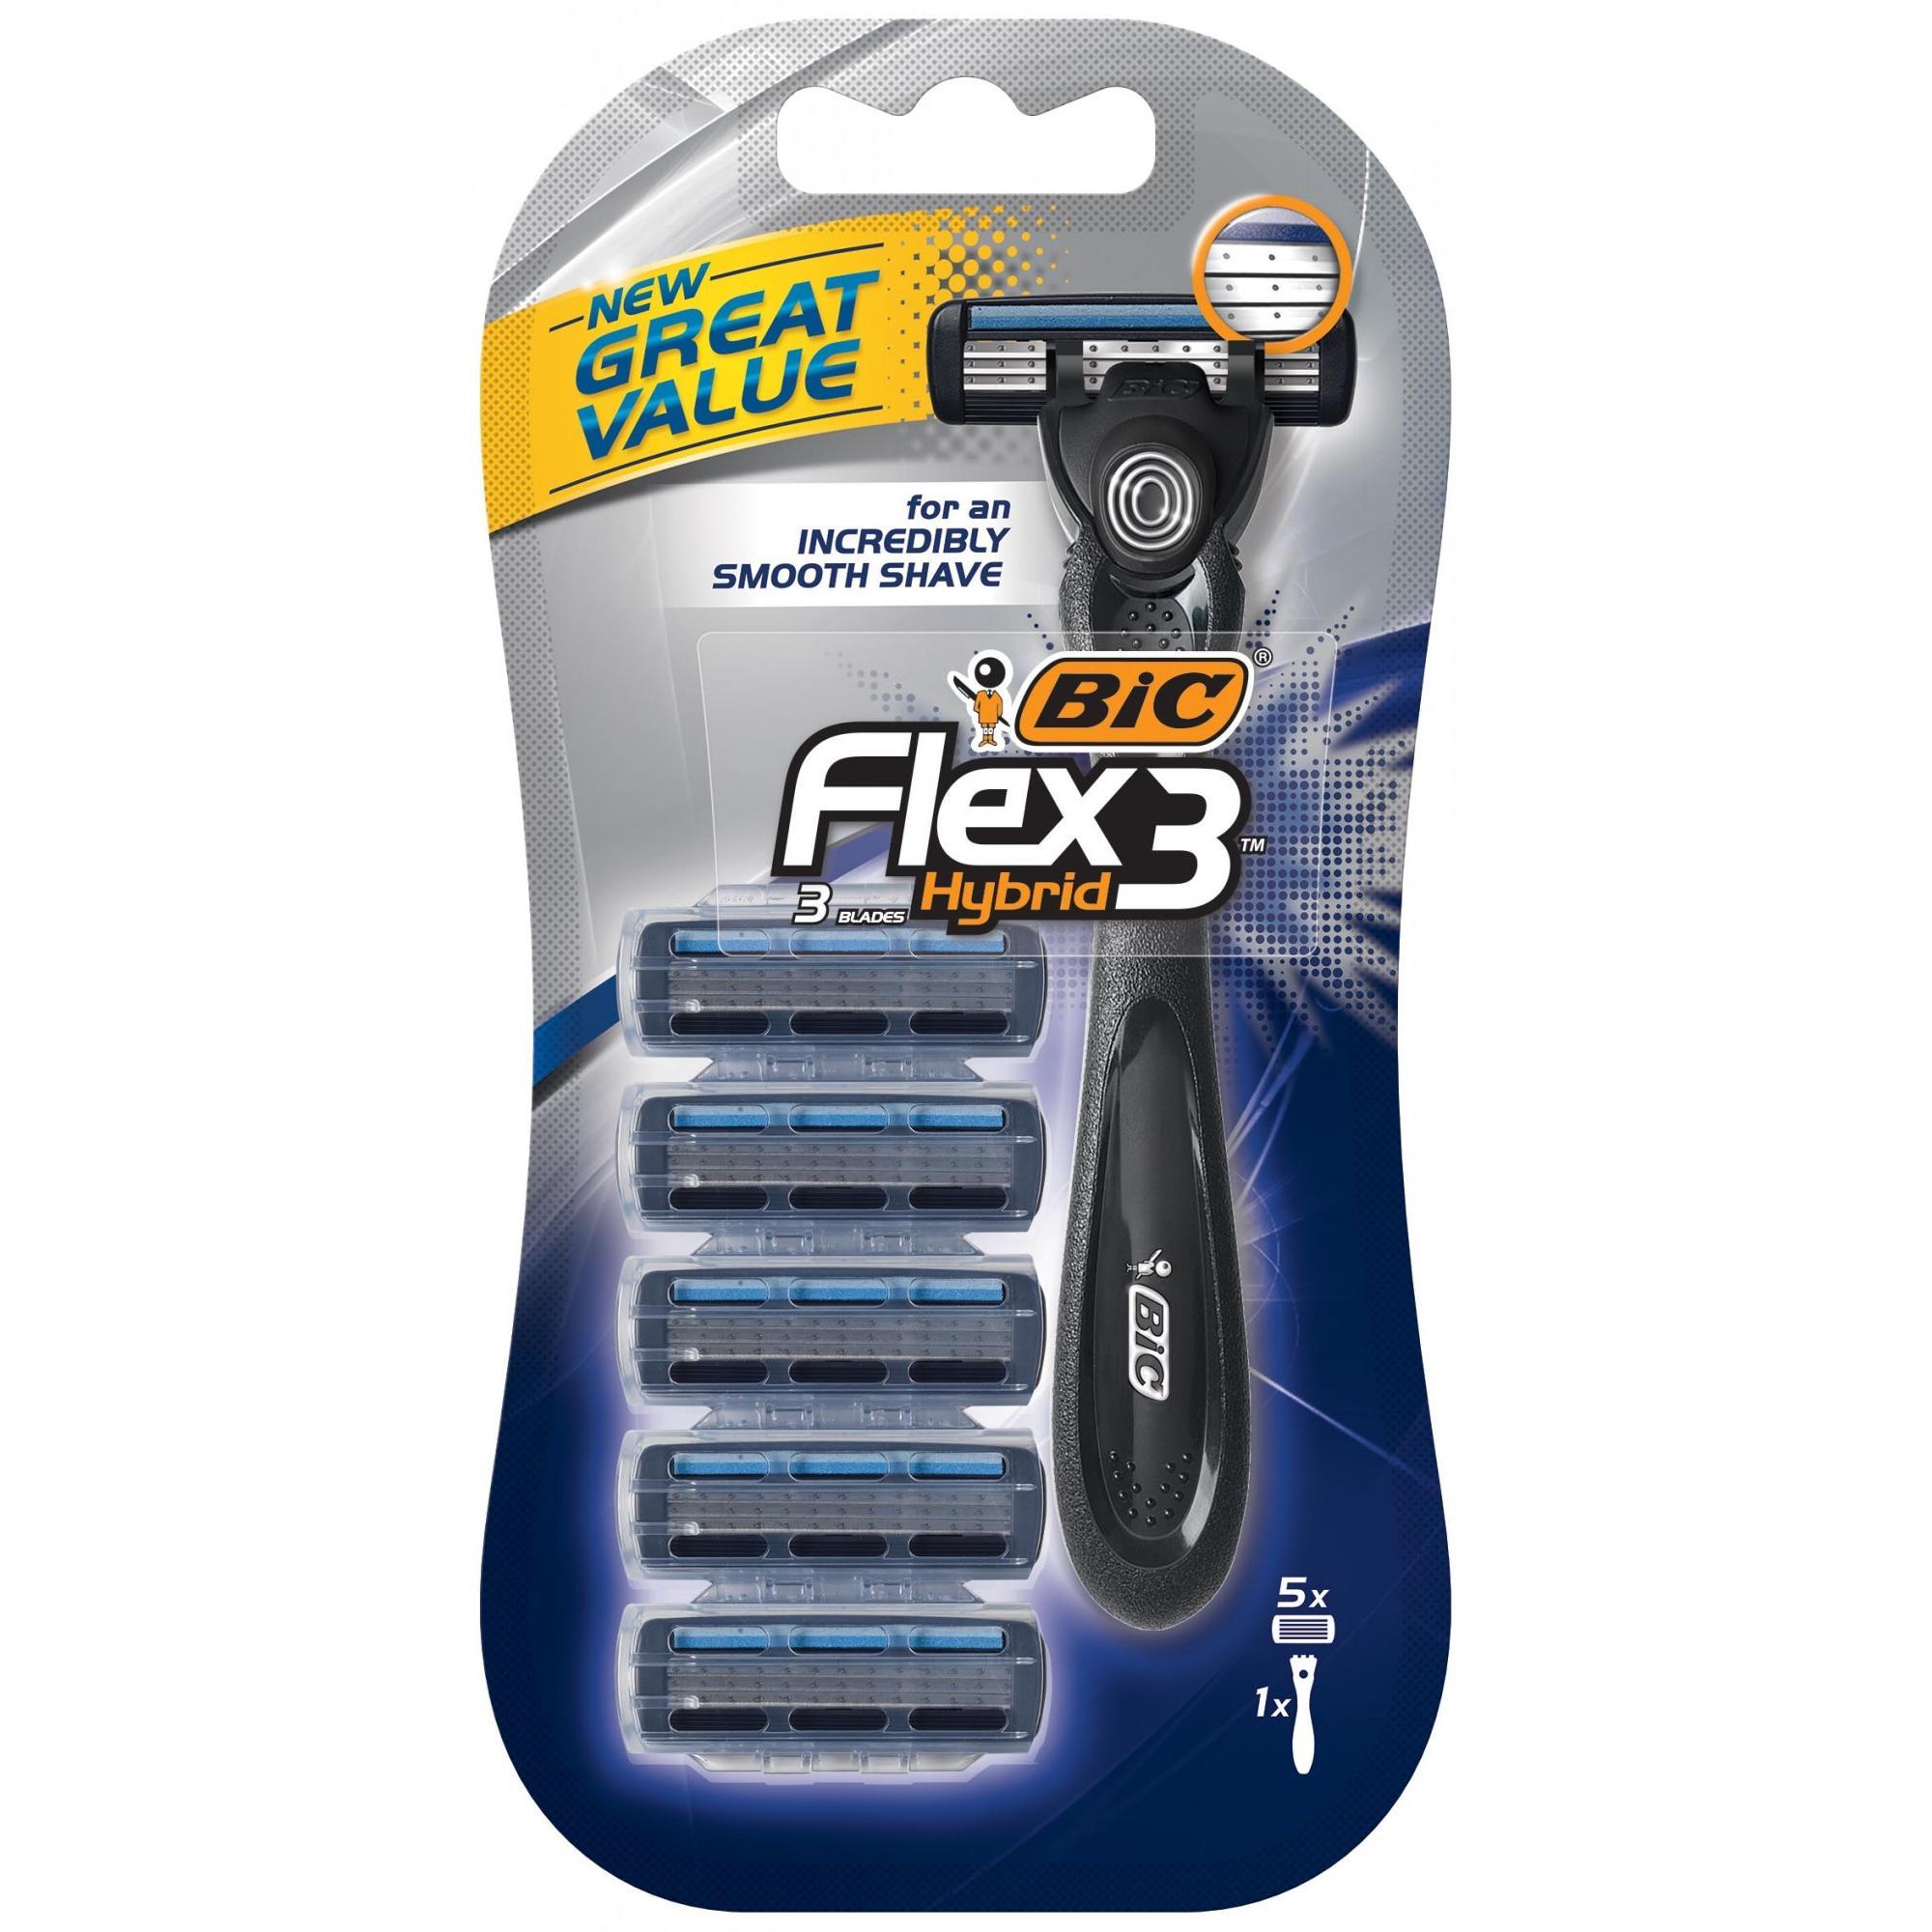 BIC Flex 3 Hybrid Men's Disposable Razor, 1 Handle, 5 Cartridges